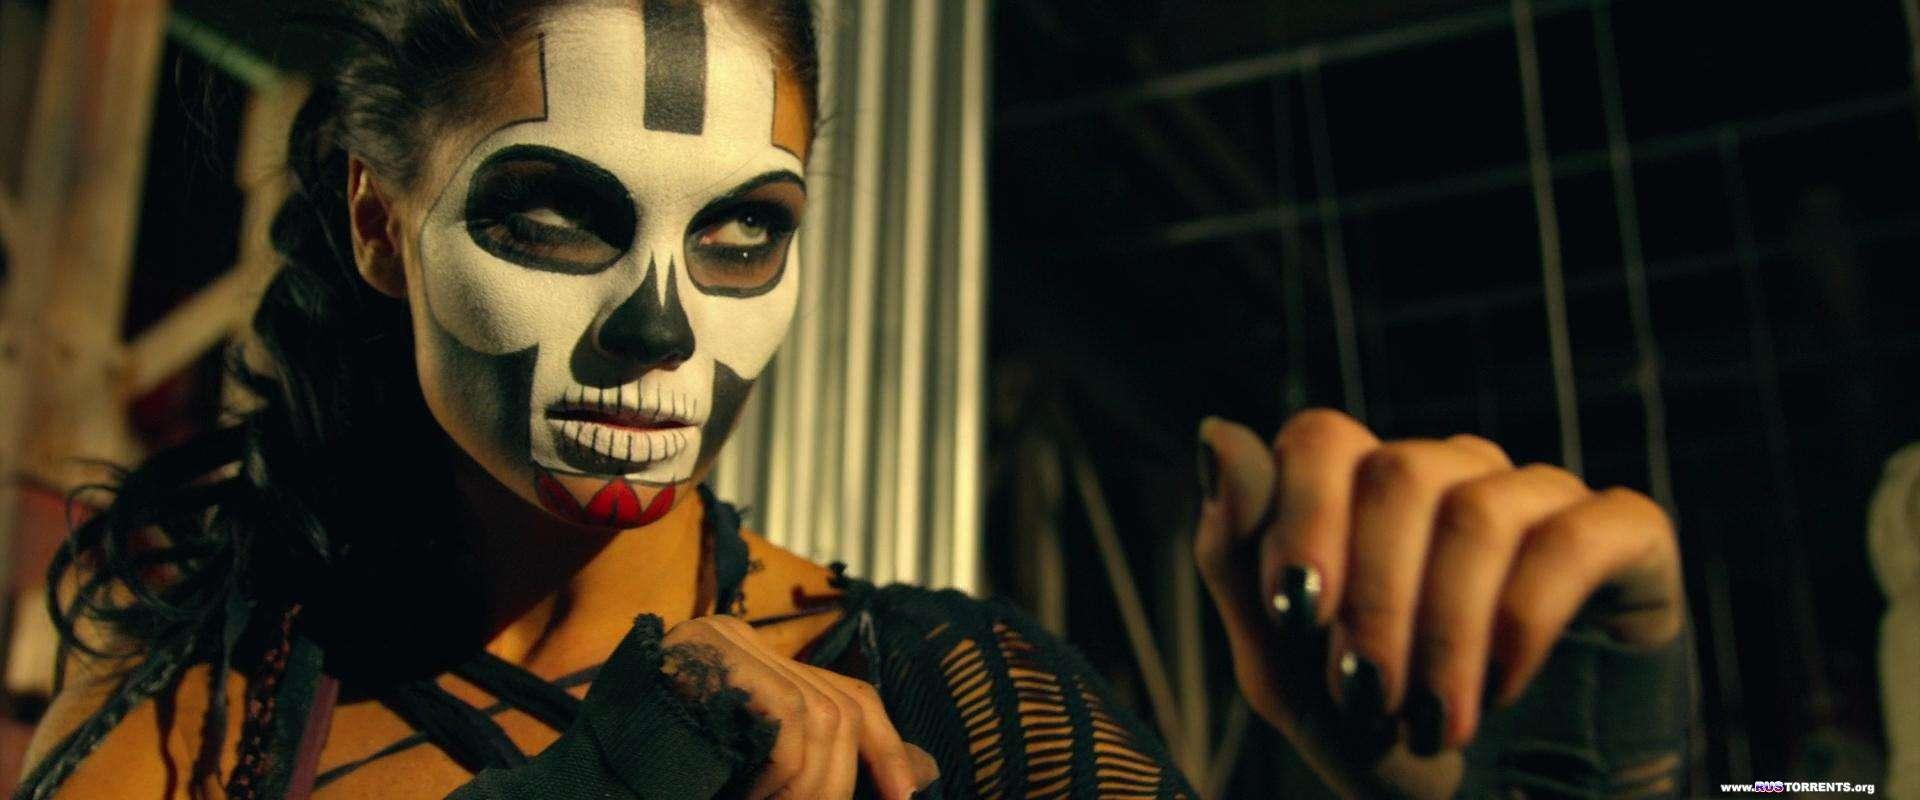 Наемный убийца | BDRip 1080p